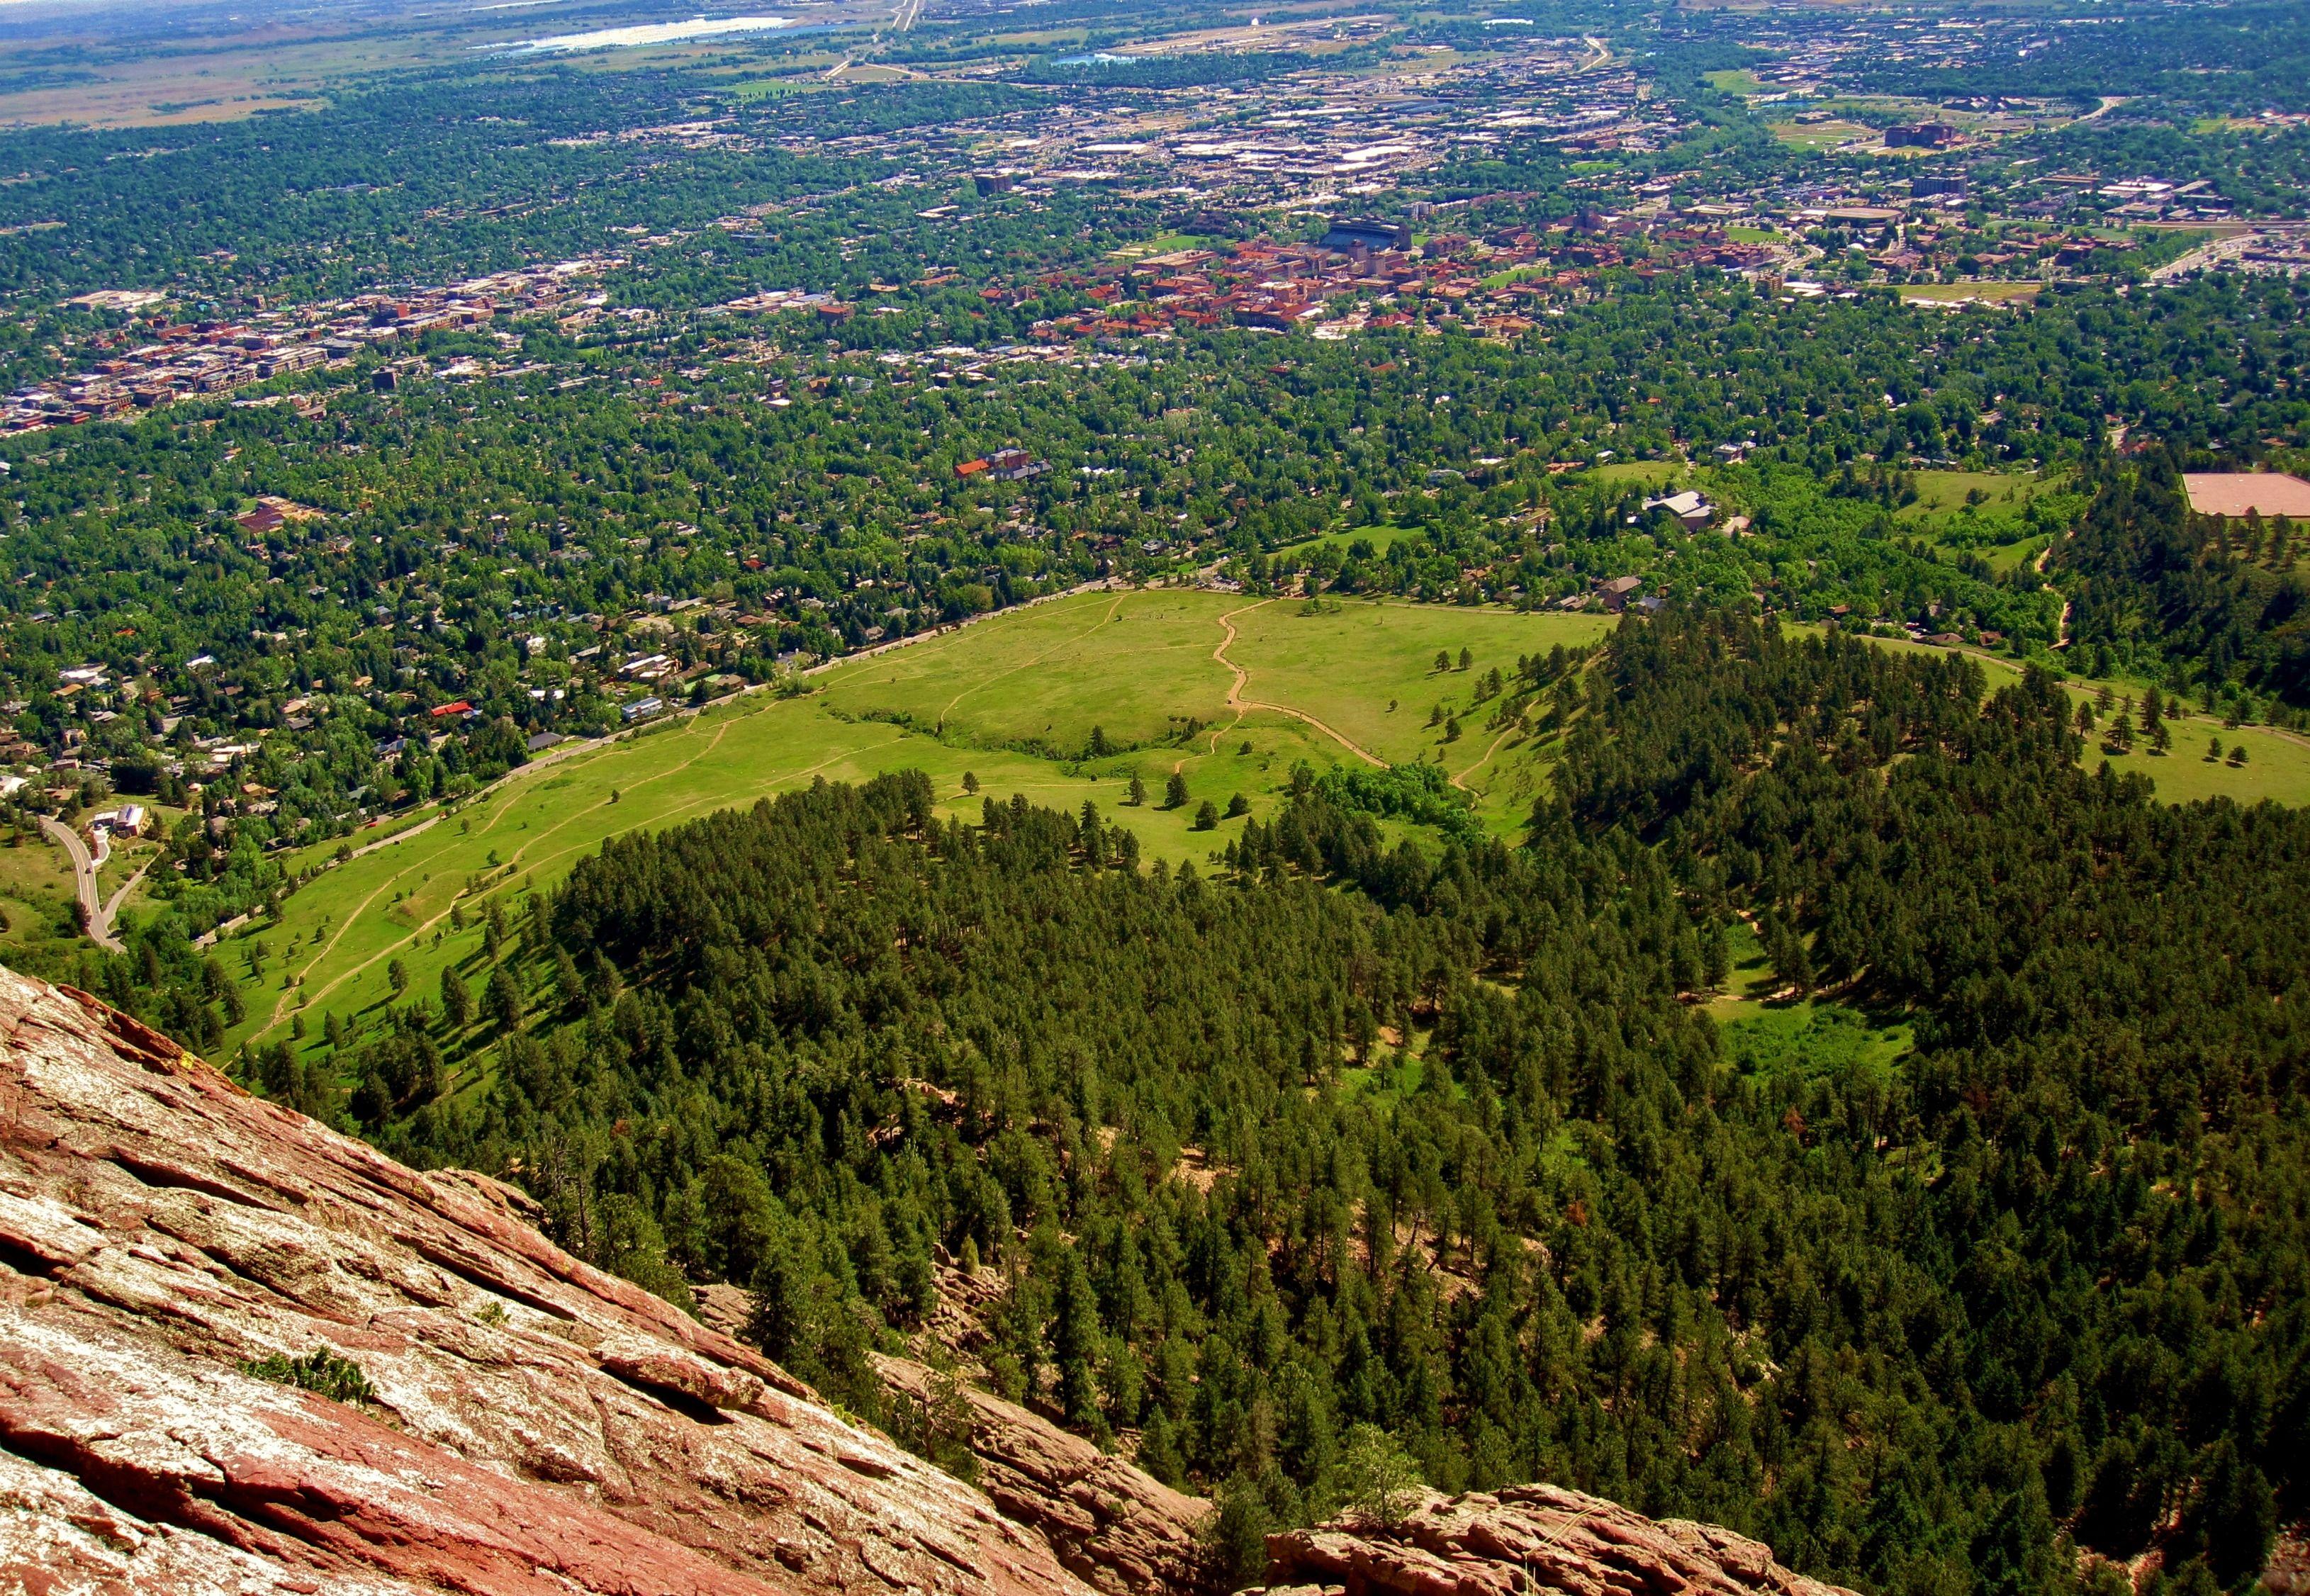 Boulder View From The Flatirons Chautauqua Park Bouldering